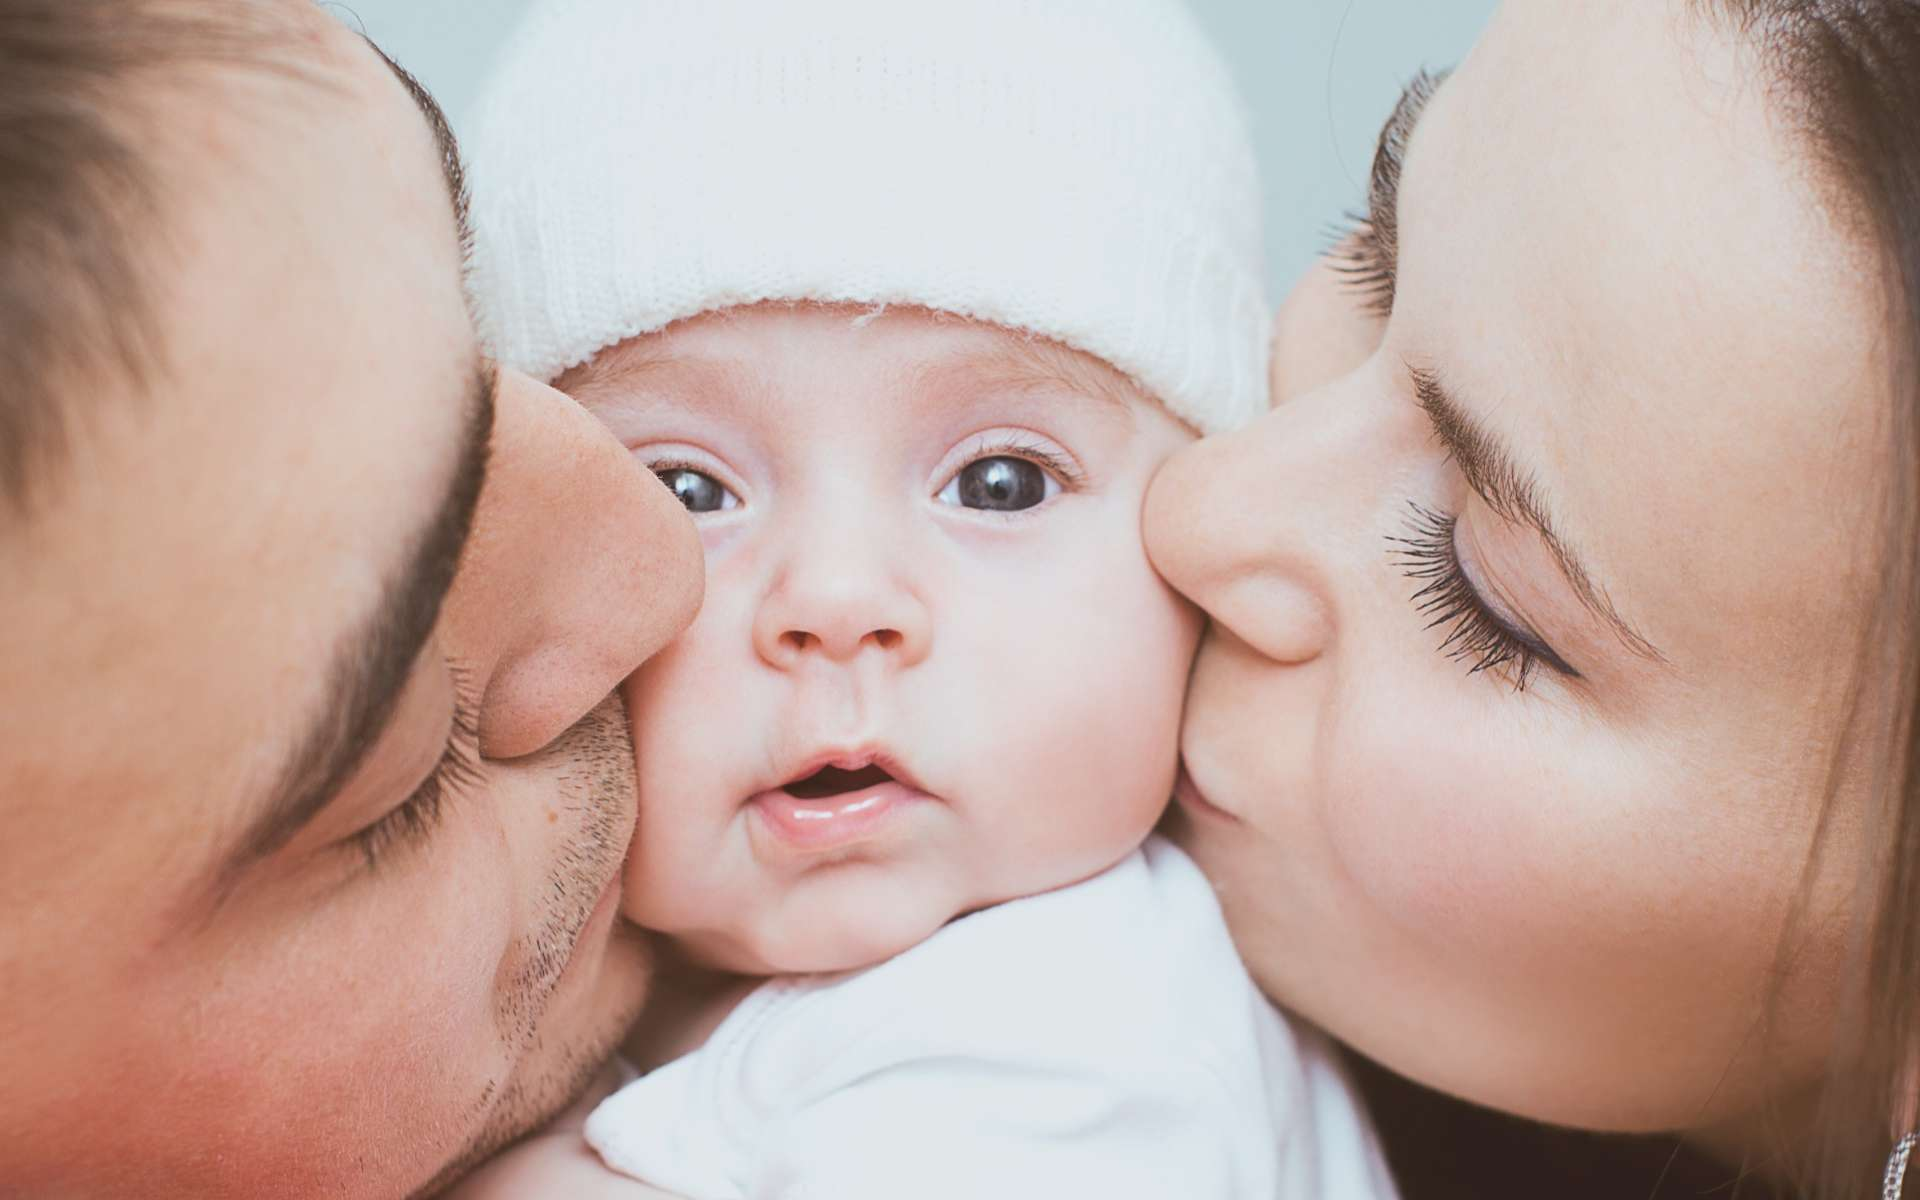 De gros câlins feront de bébé un adulte empathique. © kolinko_tanya, Adobe Stock